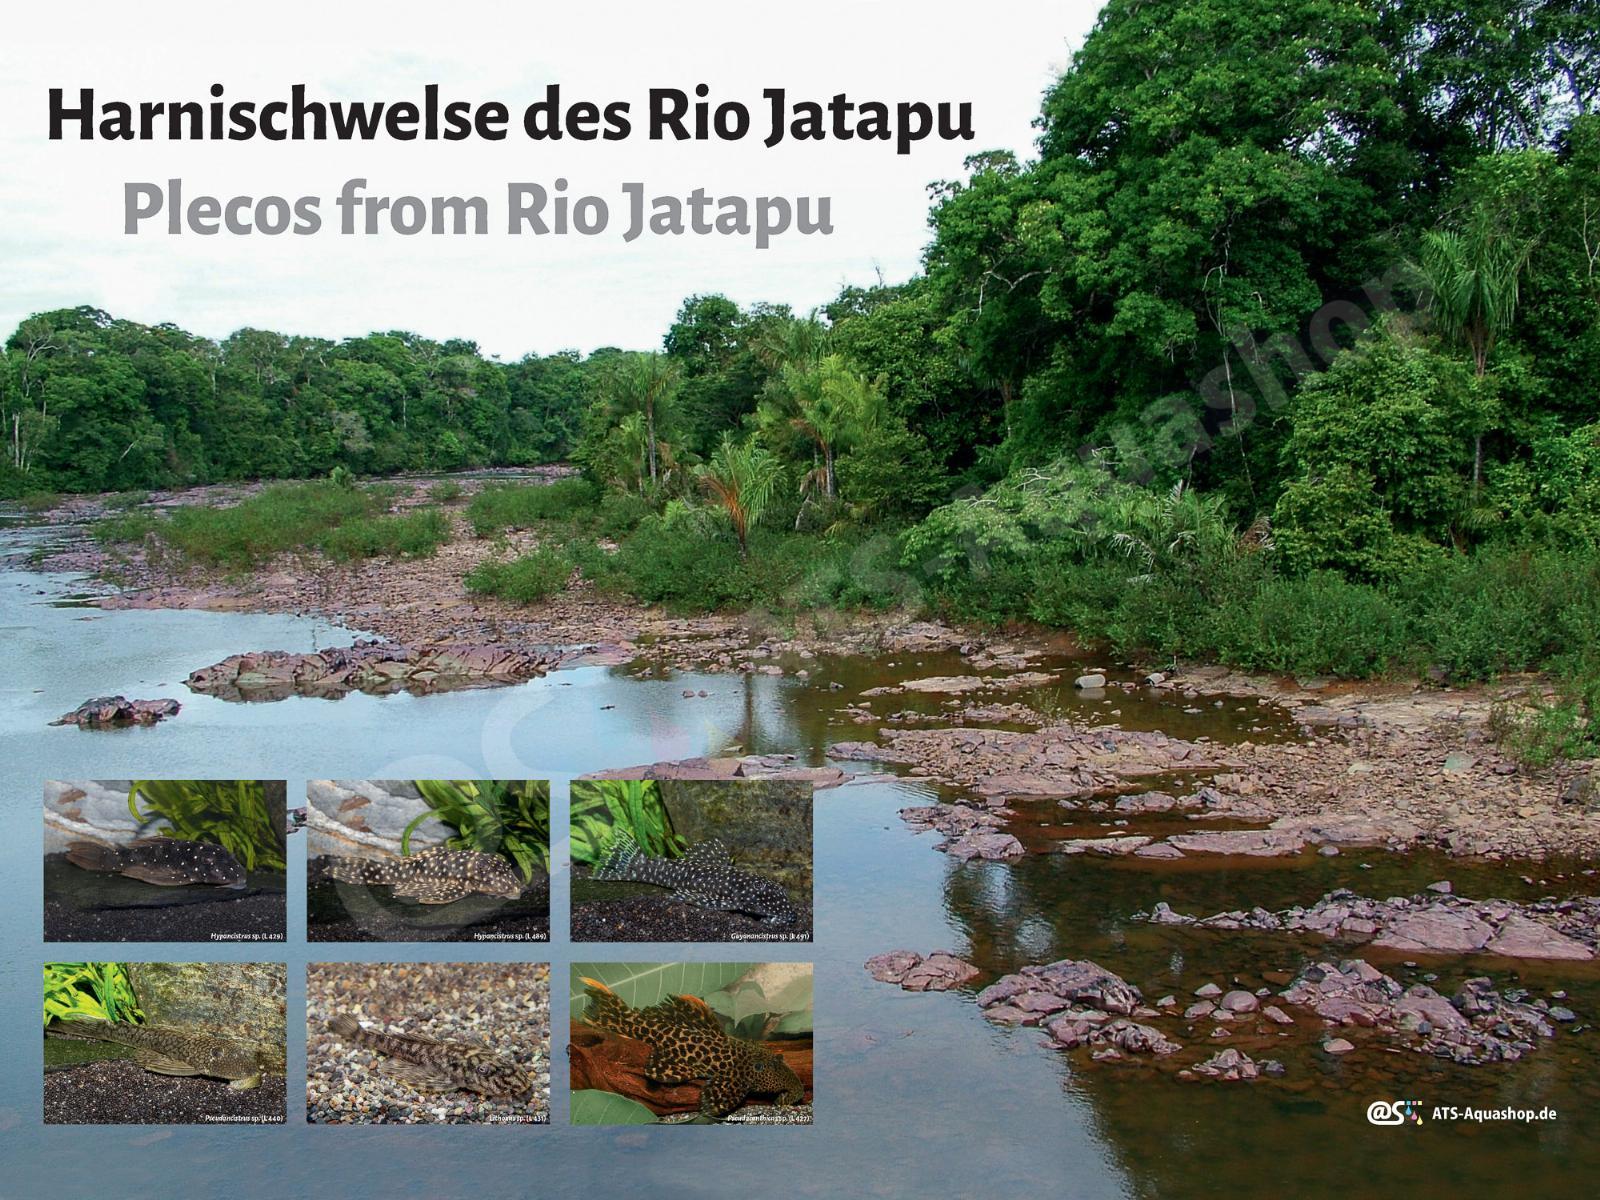 Posters: Plecos from Rio Jatapu (Andreas Tanke)